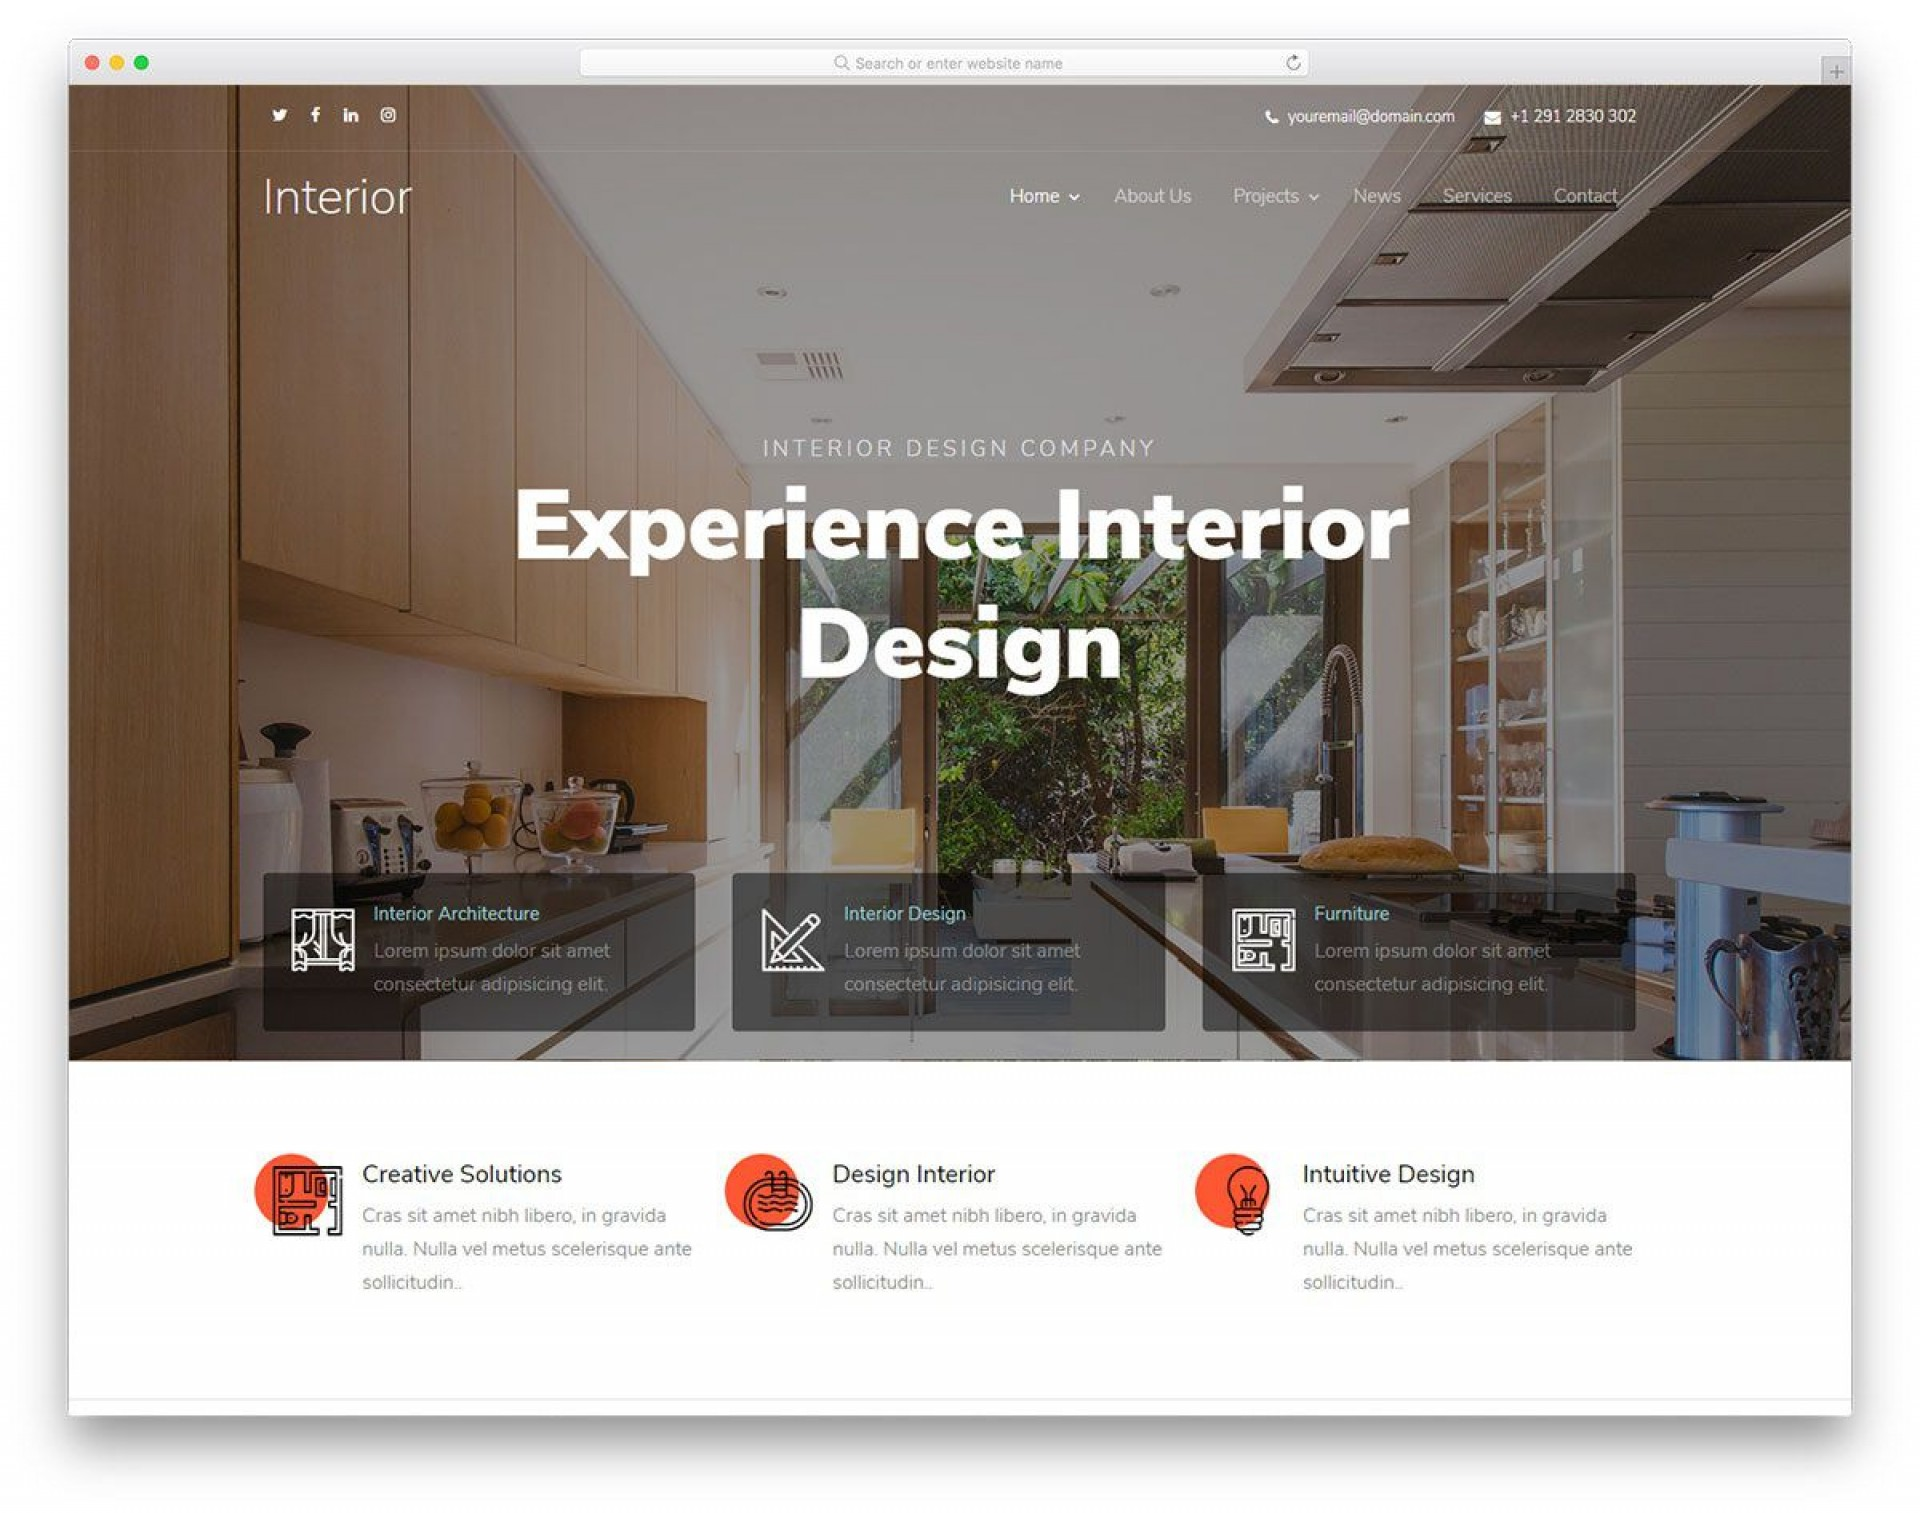 002 Incredible Interior Design Html Template Free Download 1920